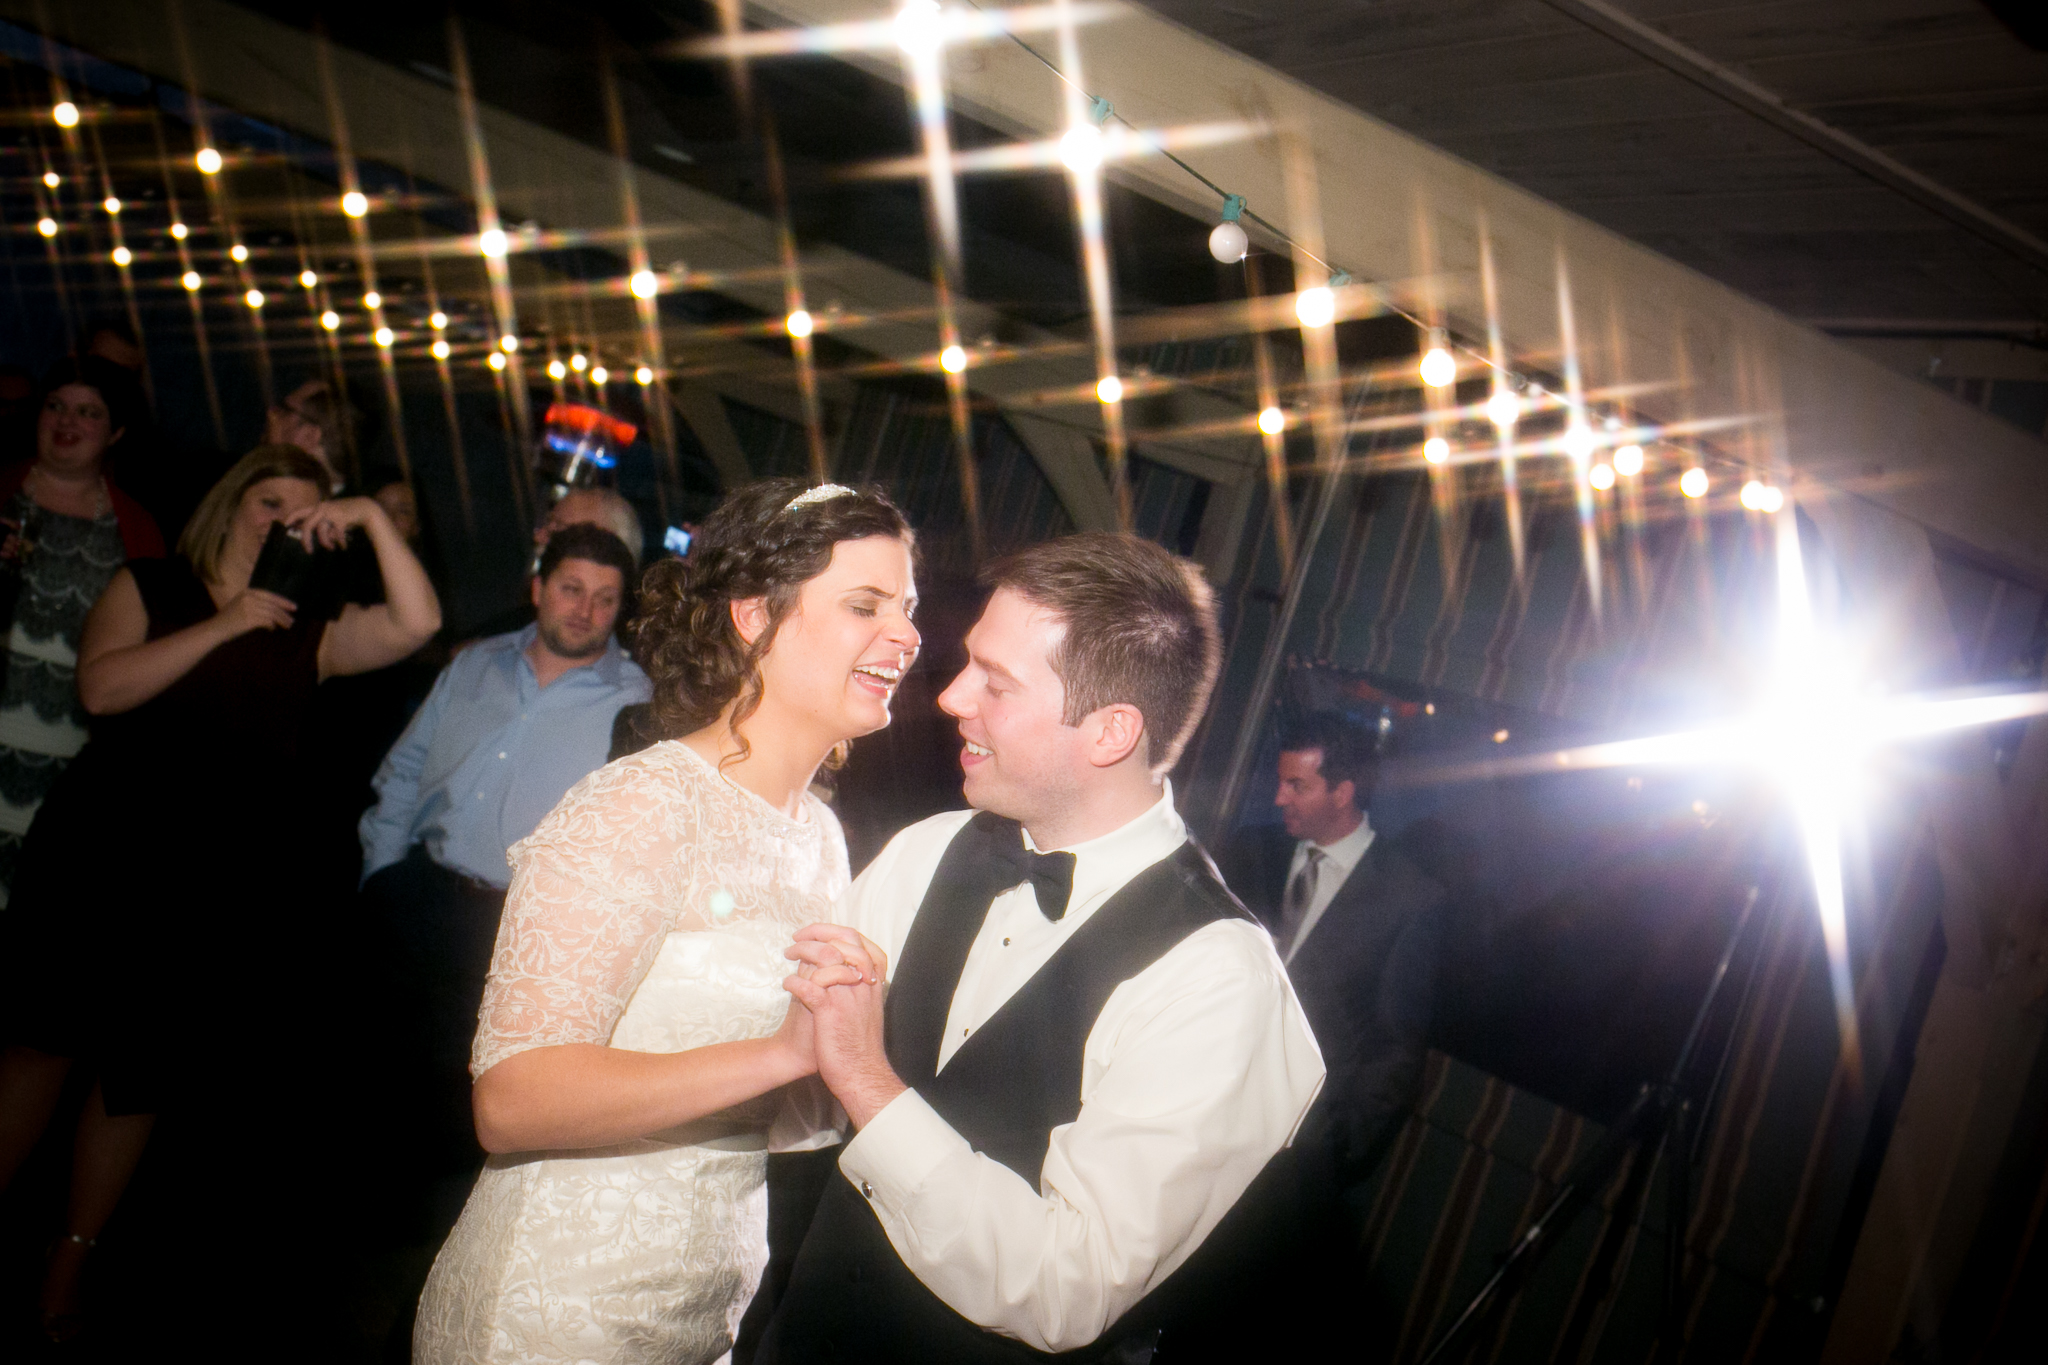 camuglia-whomstudio-chelsea_and_andy-nycphotographer-wedding-brooklyn-buffalo-timberlodge-117-5606.jpg